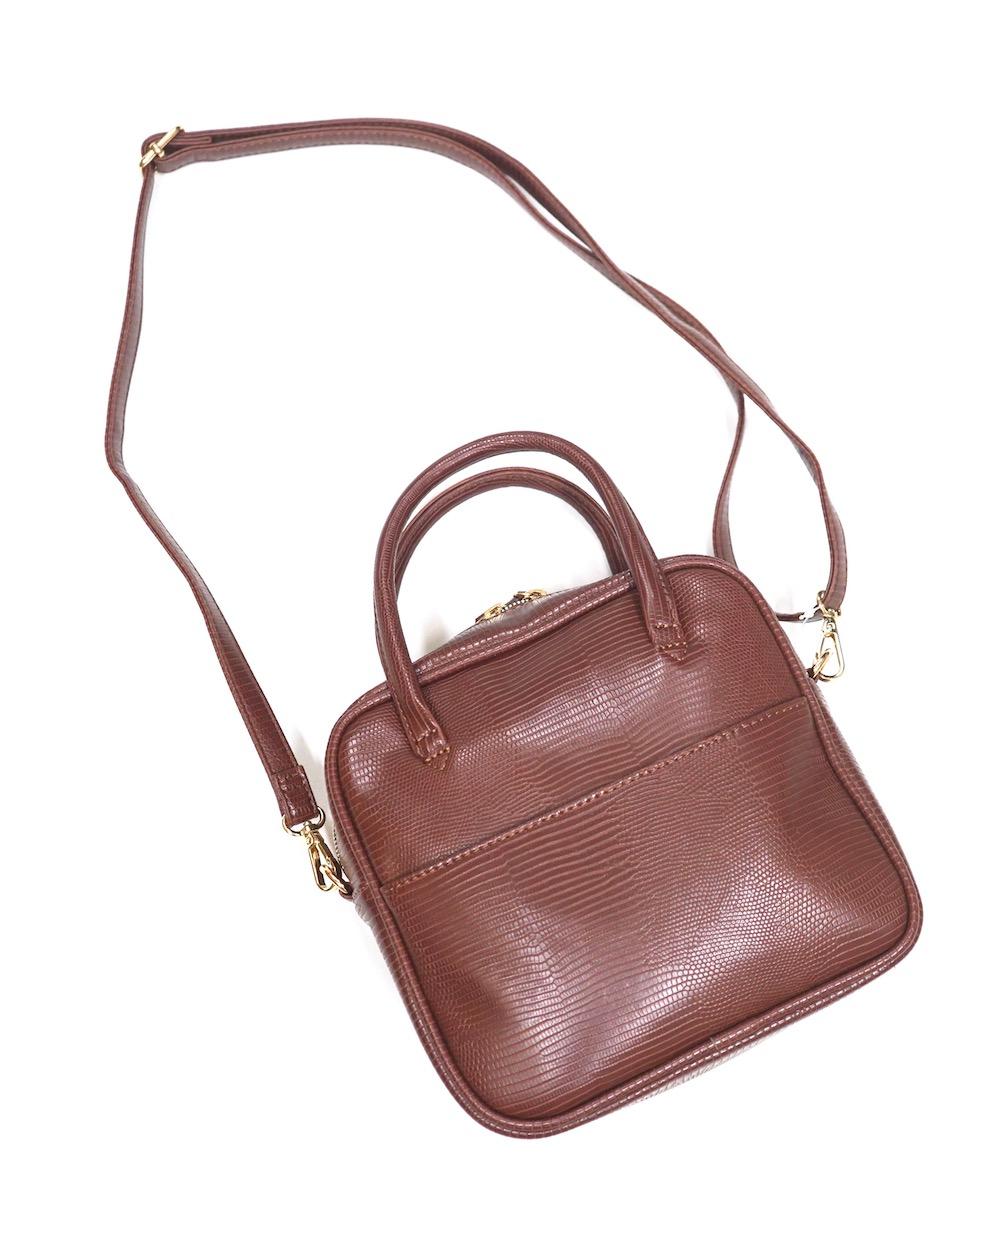 2way Square Shoulder Boston Bag(brown)